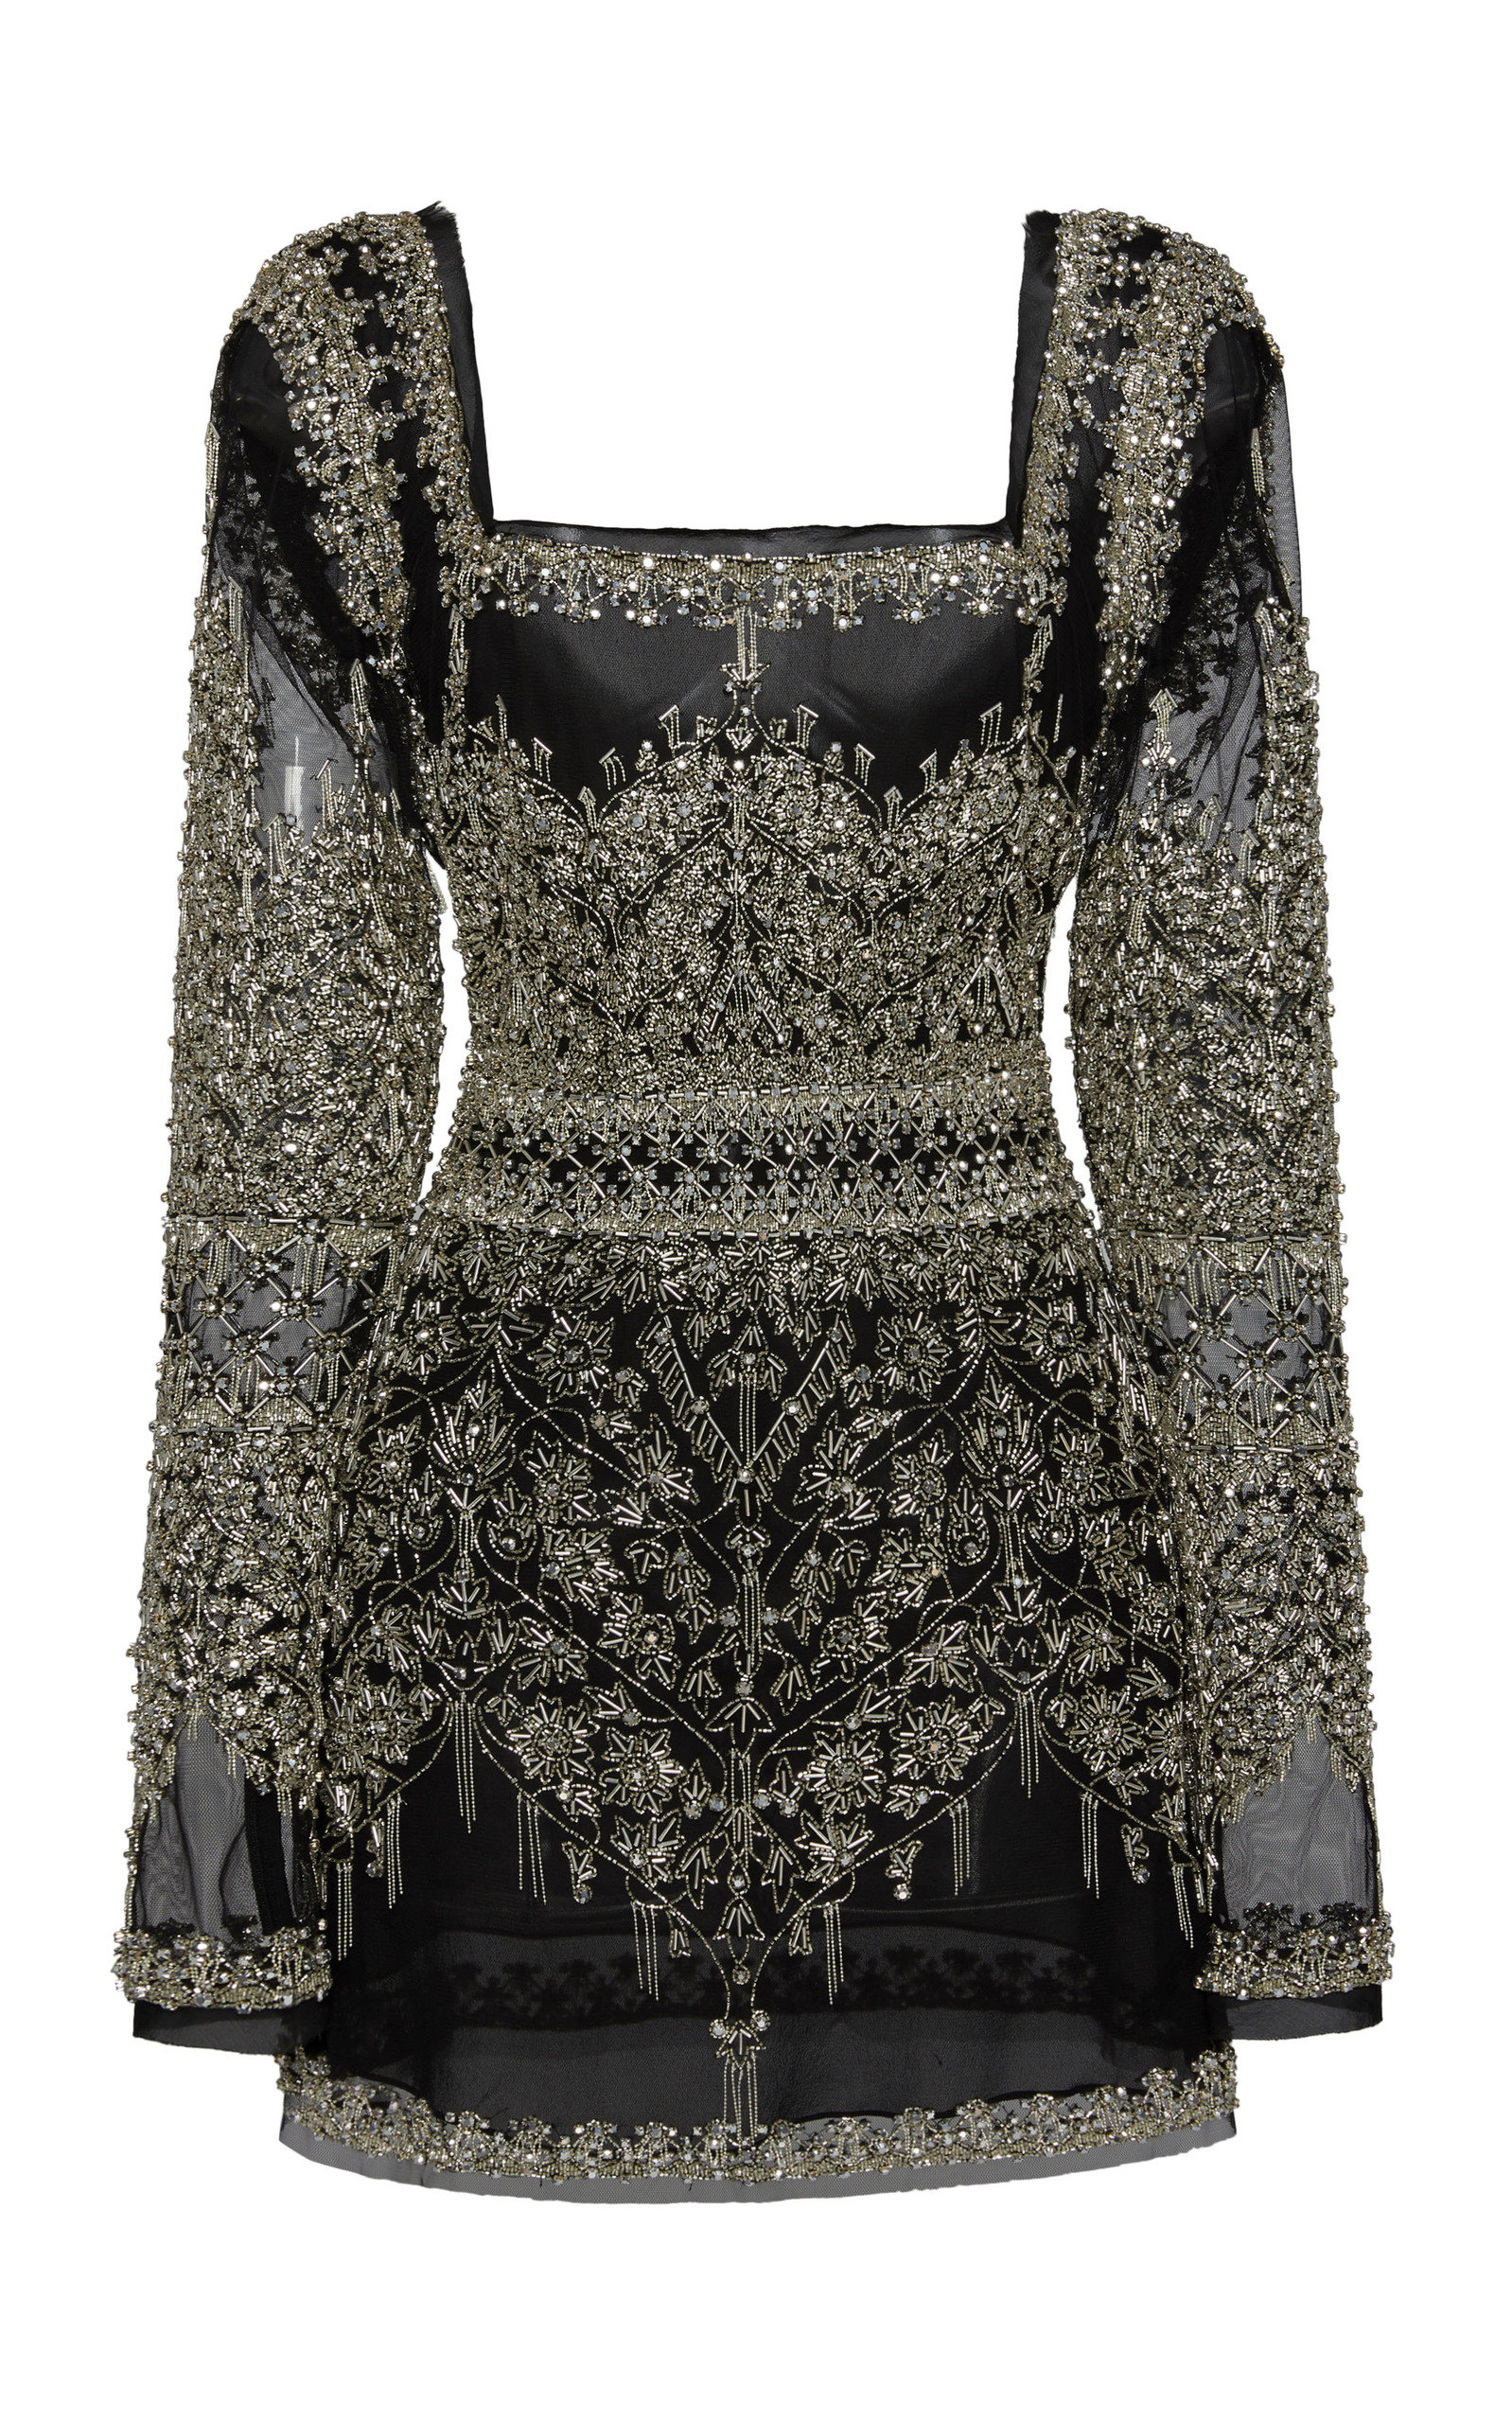 CUCCULELLI SHAHEEN Floreale Armore Mini Dress in Black